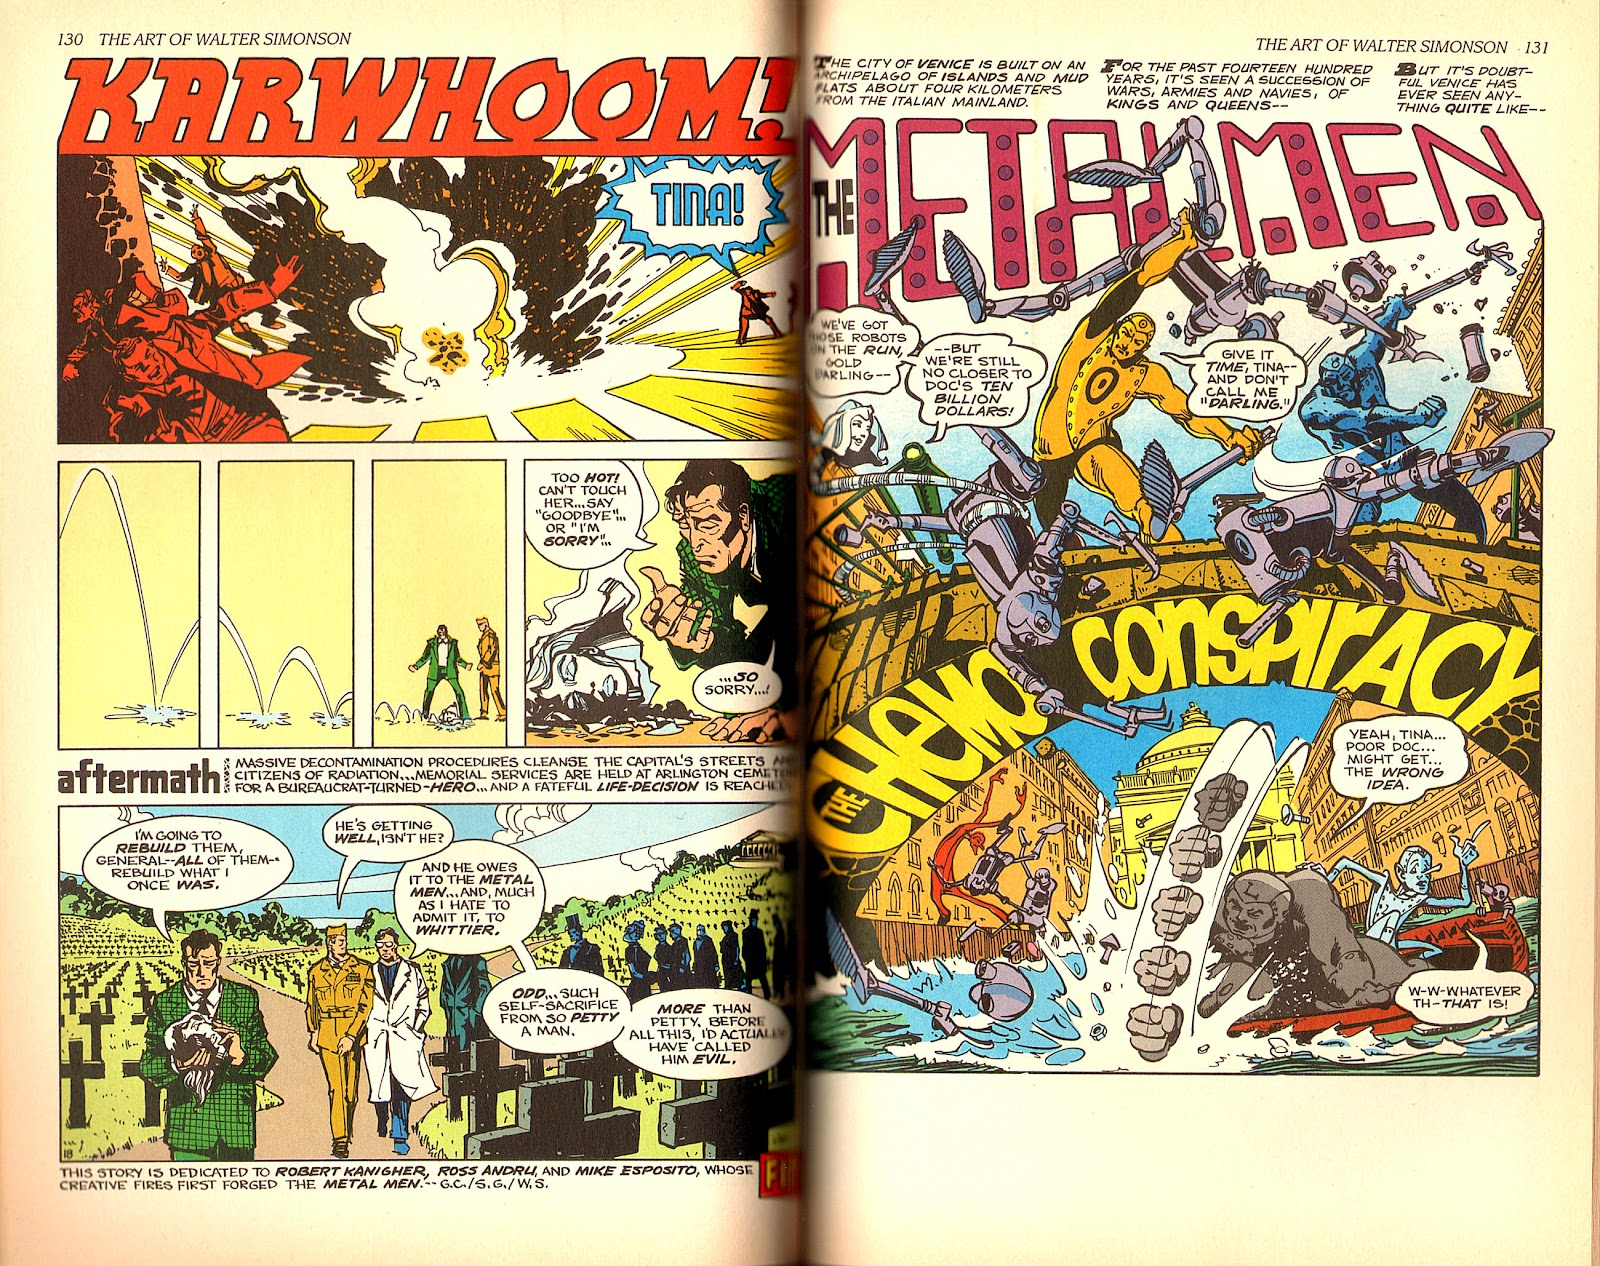 Read online The Art of Walter Simonson comic -  Issue # TPB - 67